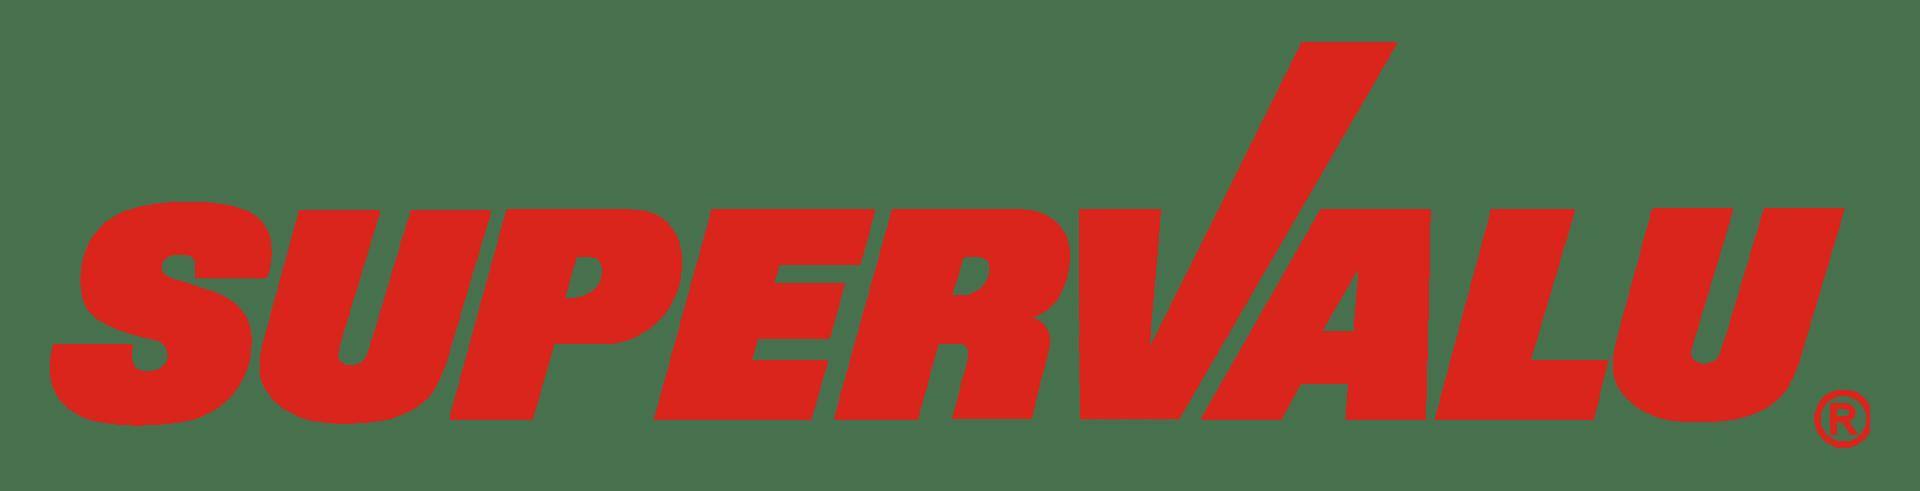 https://norcalnaturallyspecialfoodbroker.com/wp-content/uploads/2019/02/SuperValu-Logo.png